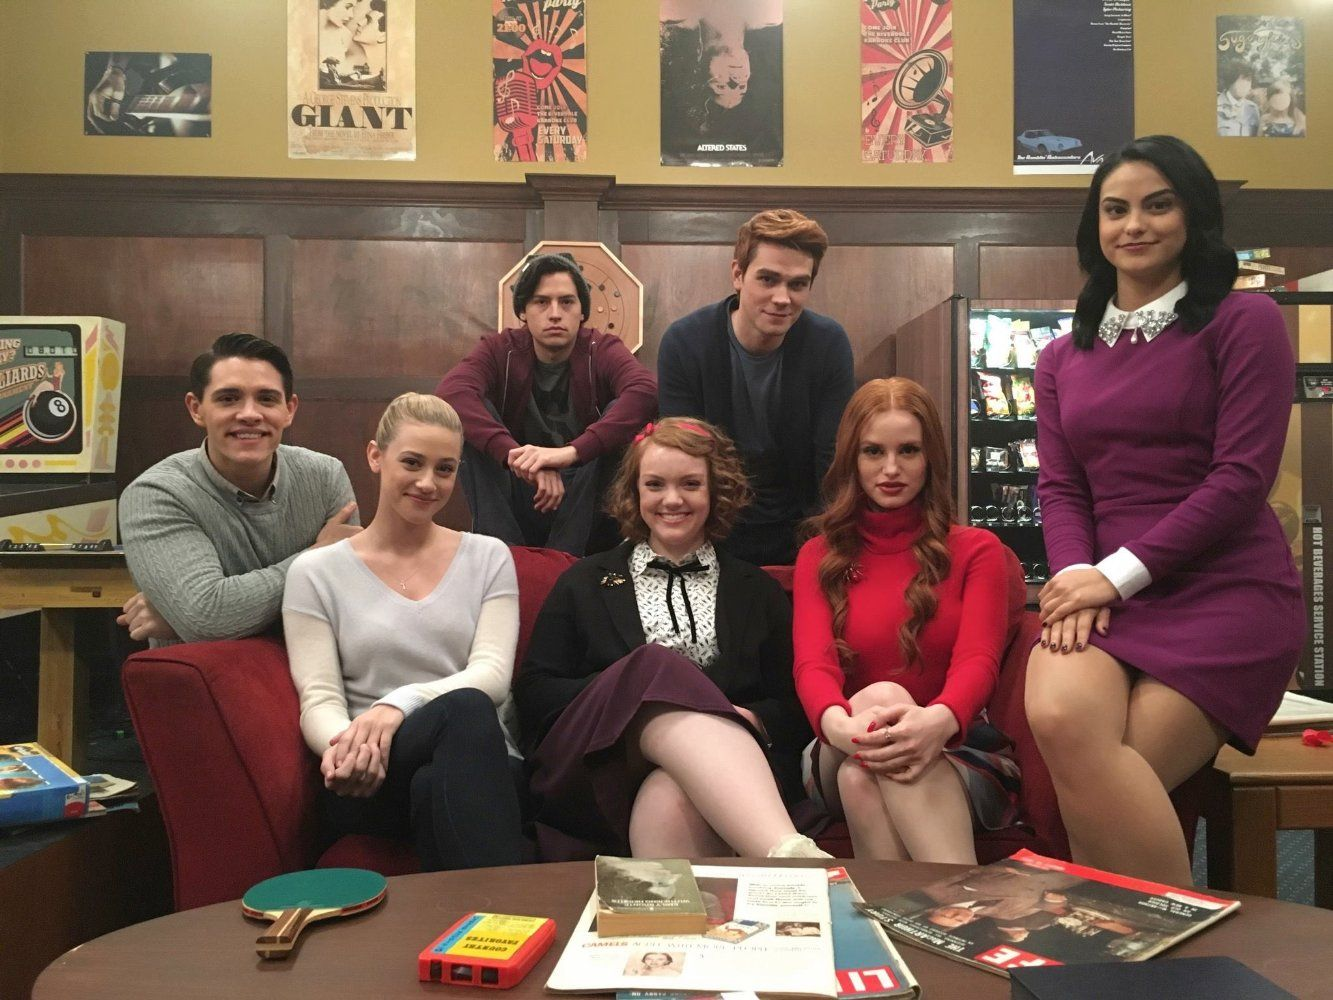 Riverdale Cast Image 31 Tv Series Pinterest Tvs